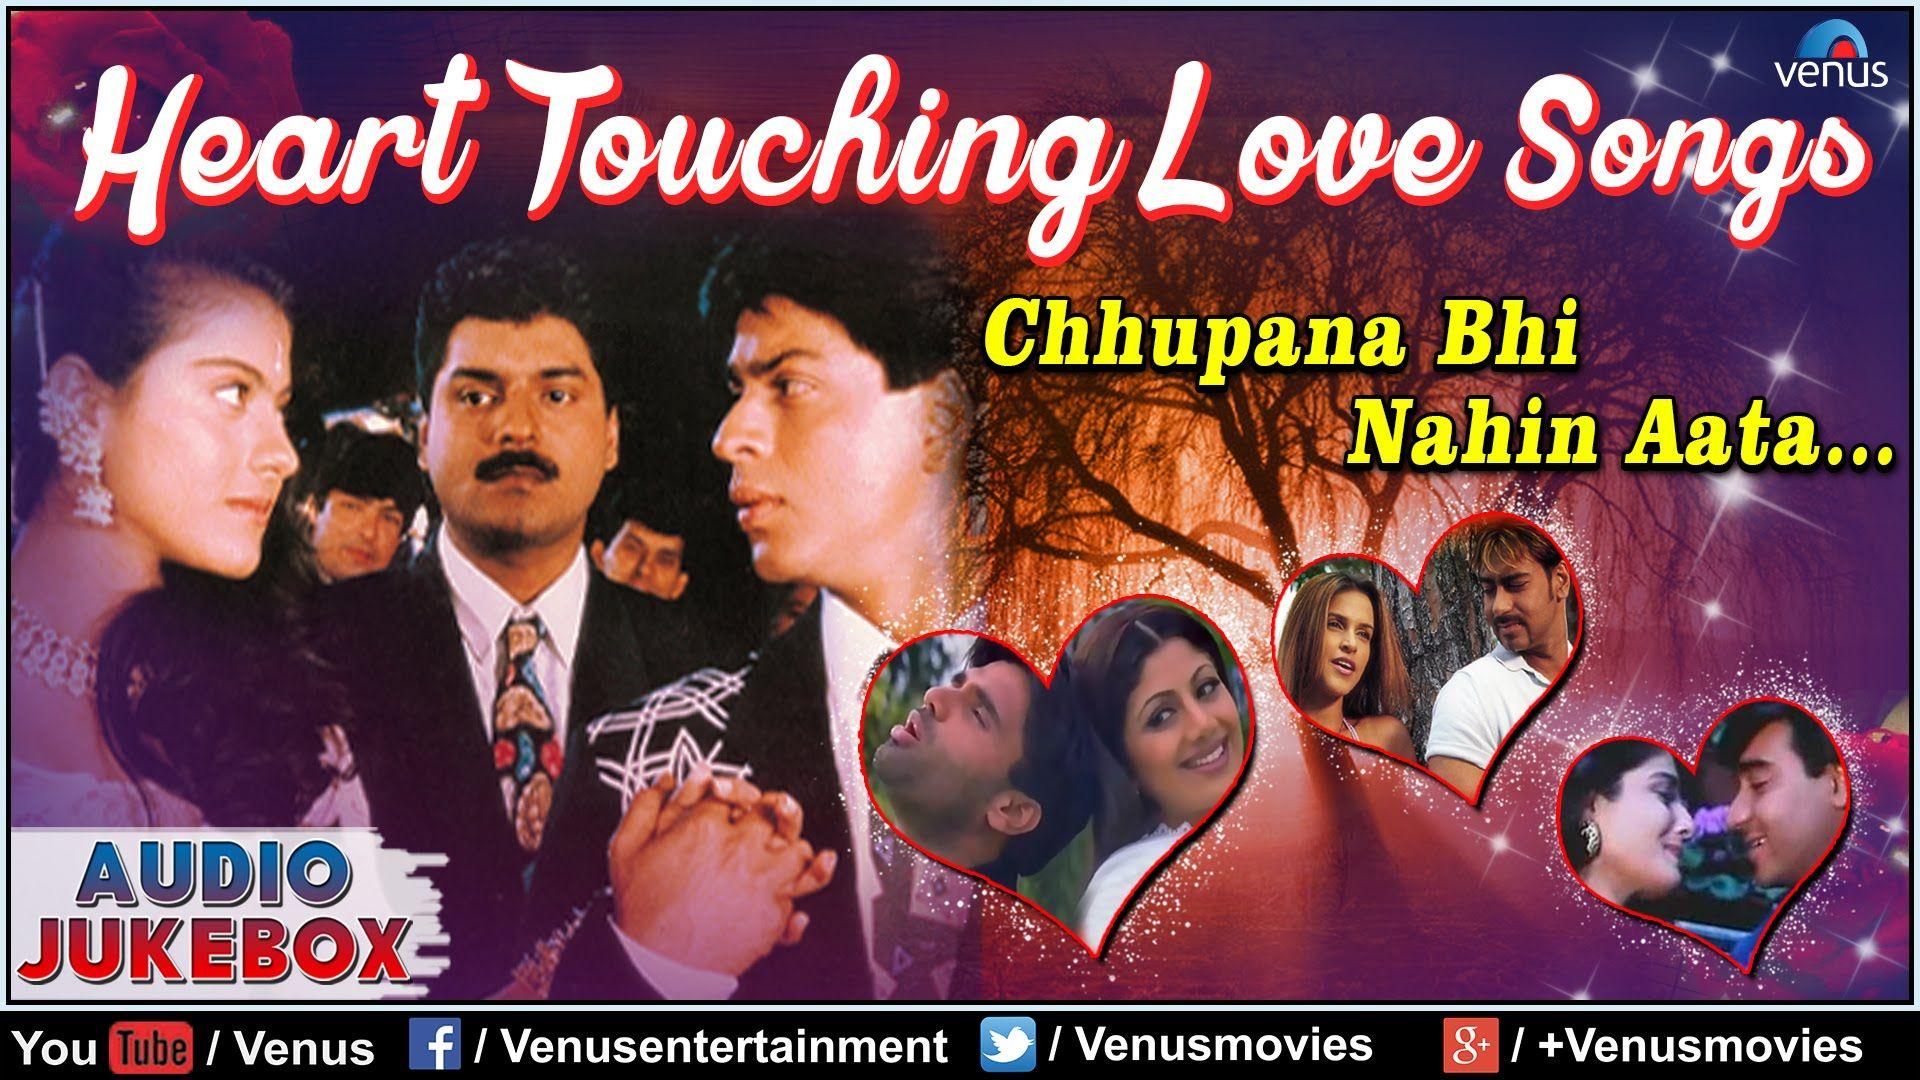 Heart Touching Love Songs Chhupana Bhi Nahin Aata Romantic Hits 90s Hit Songs Bollywood Songs Songs